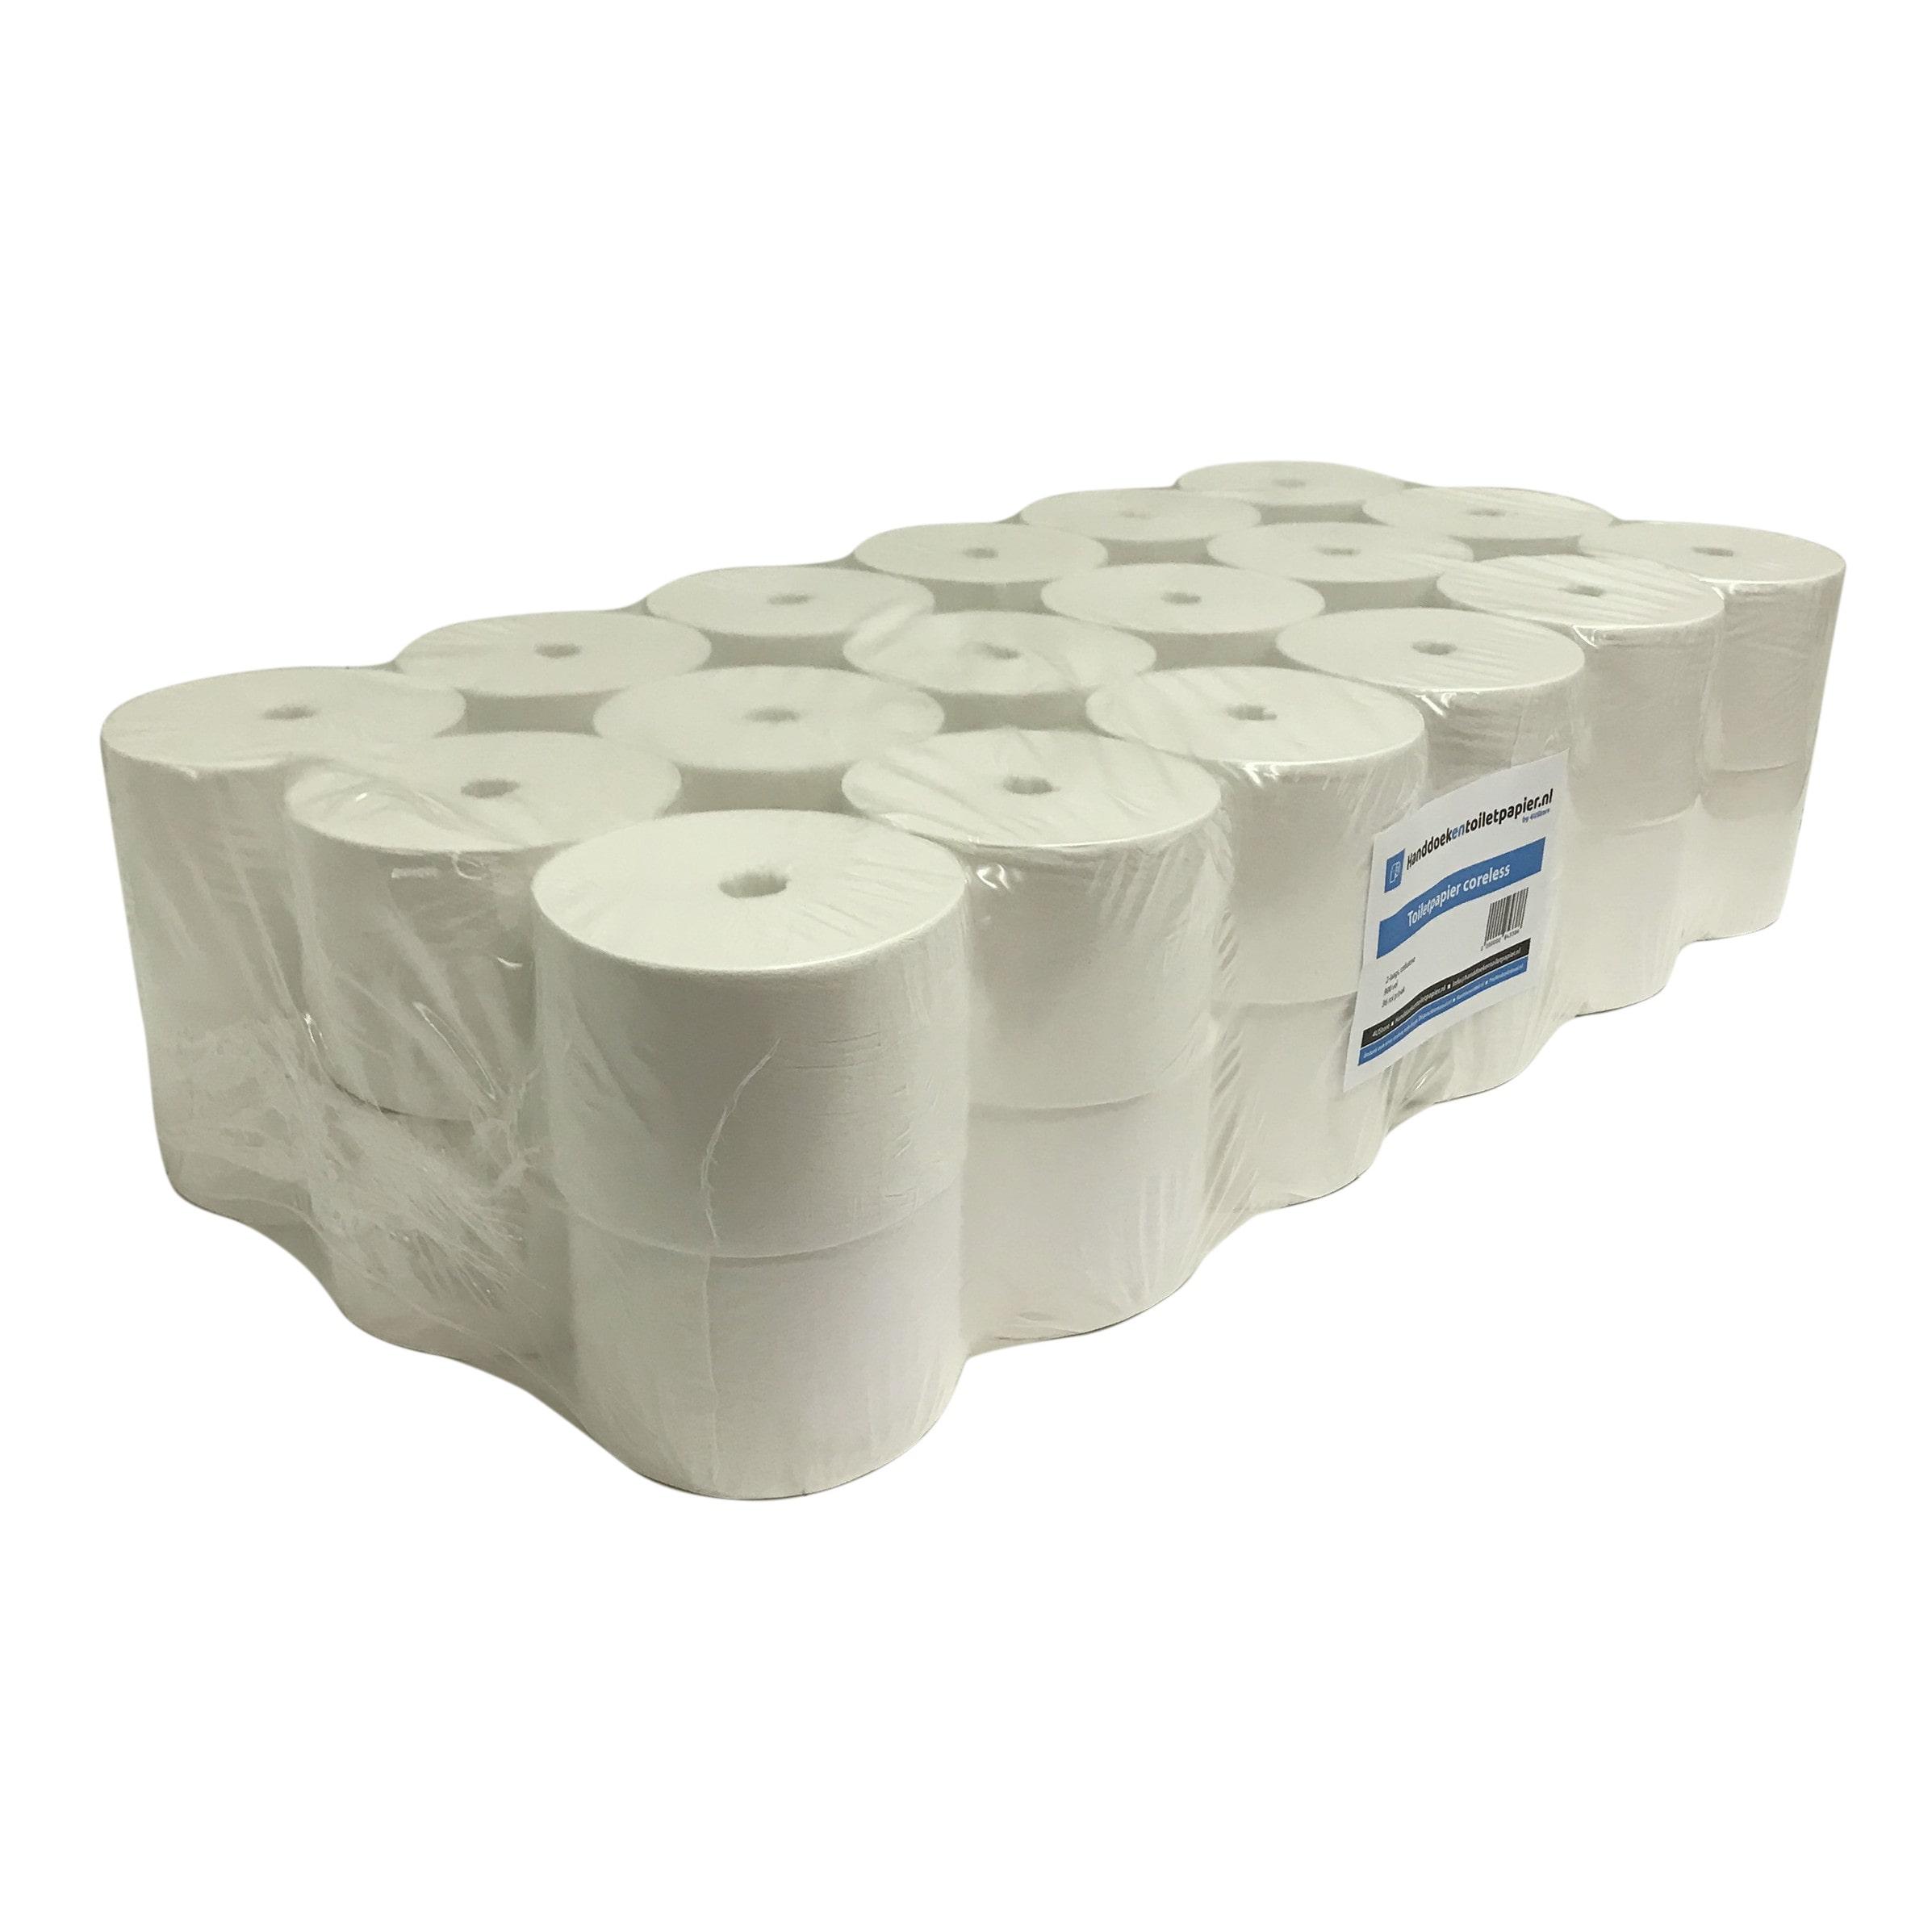 4UStore Coreless Toiletpapier 2-laags Cellulose 36 rollen